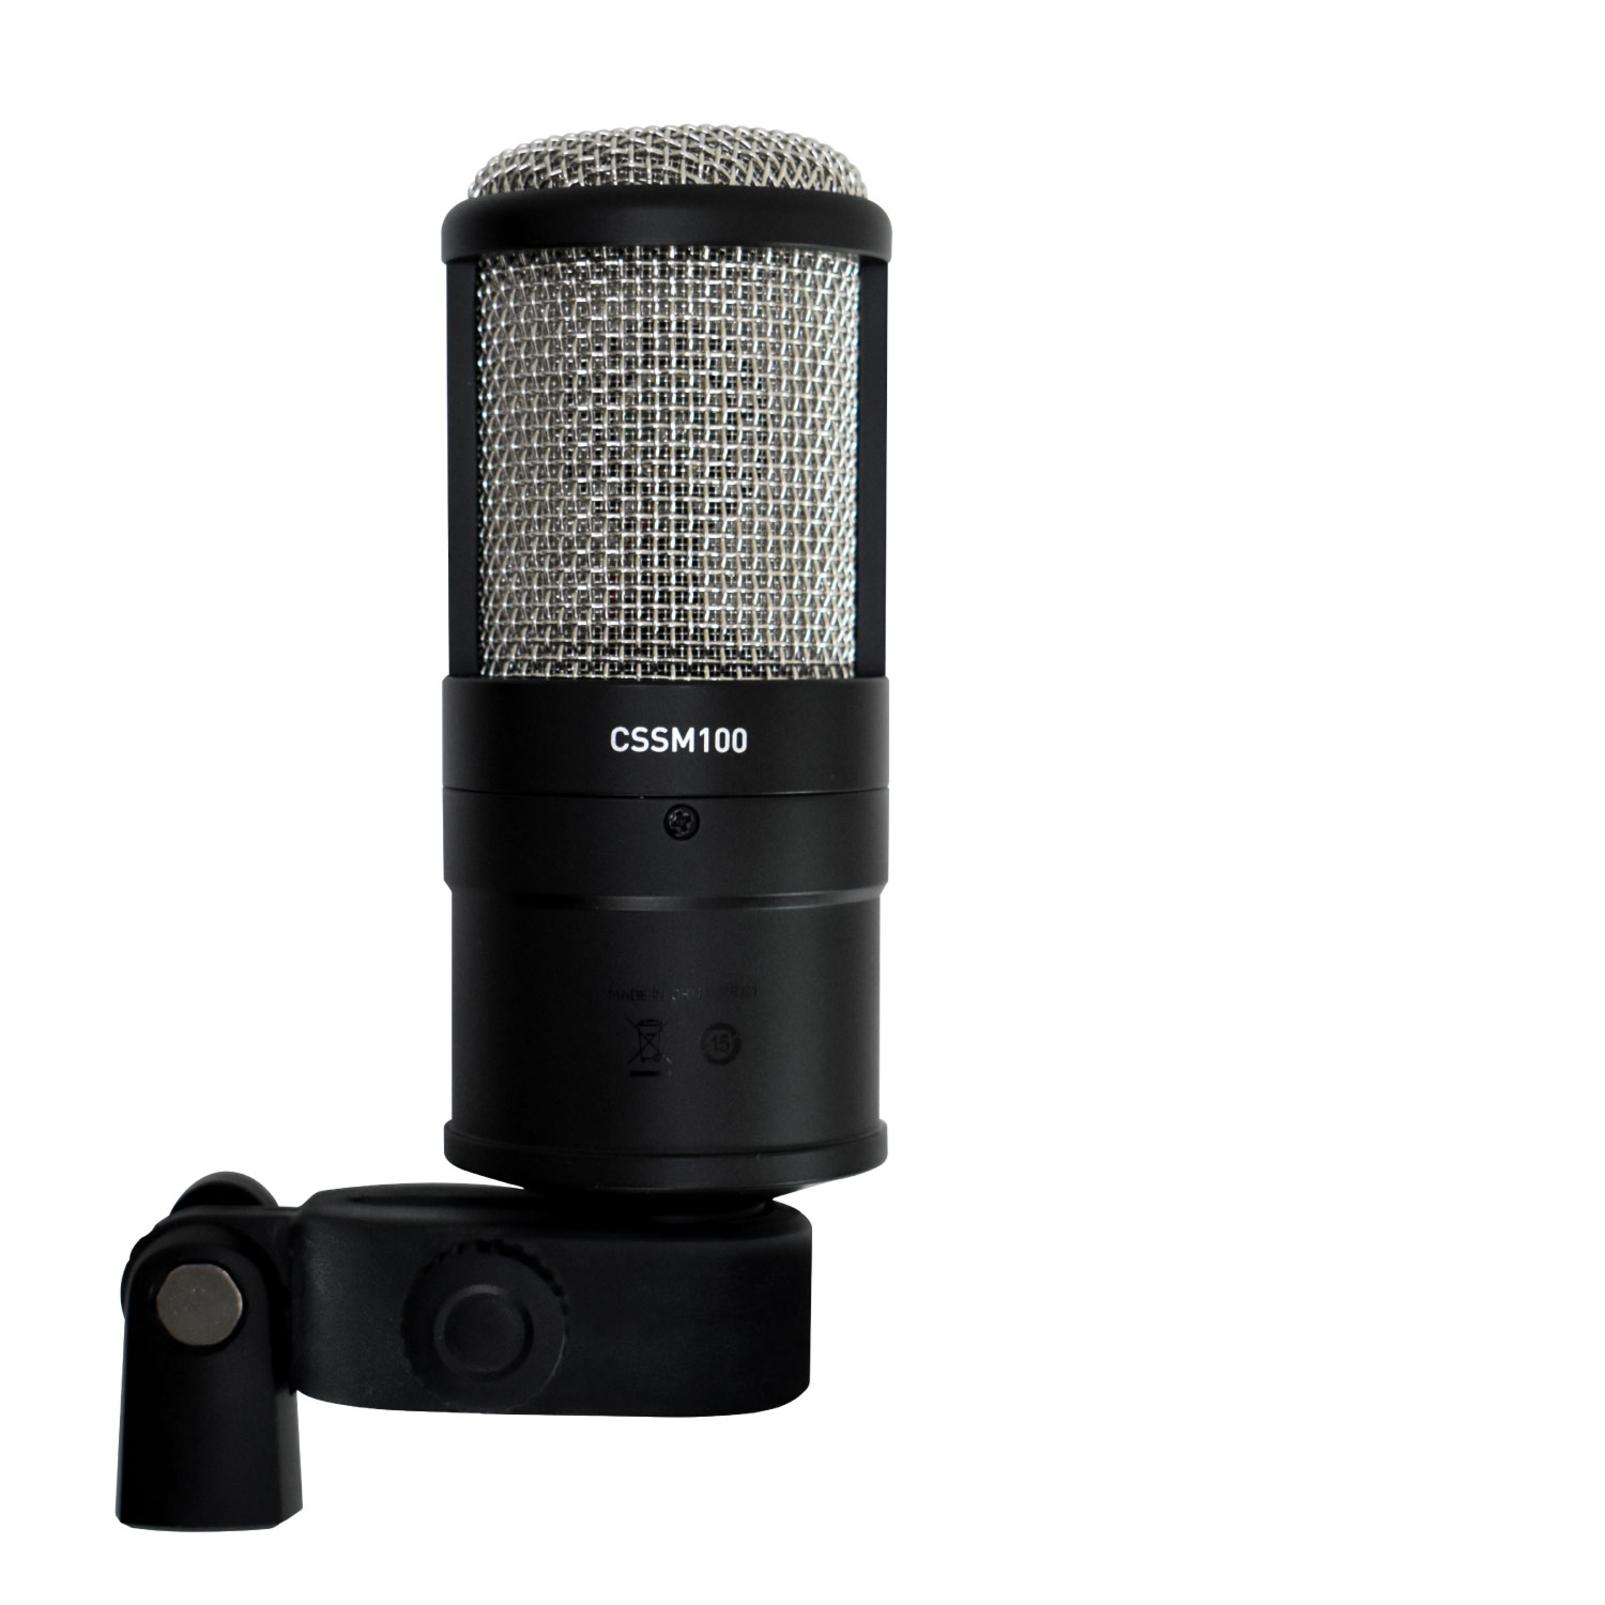 CSSM100 - Black - Studio Condenser Microphone - Detailshot 3